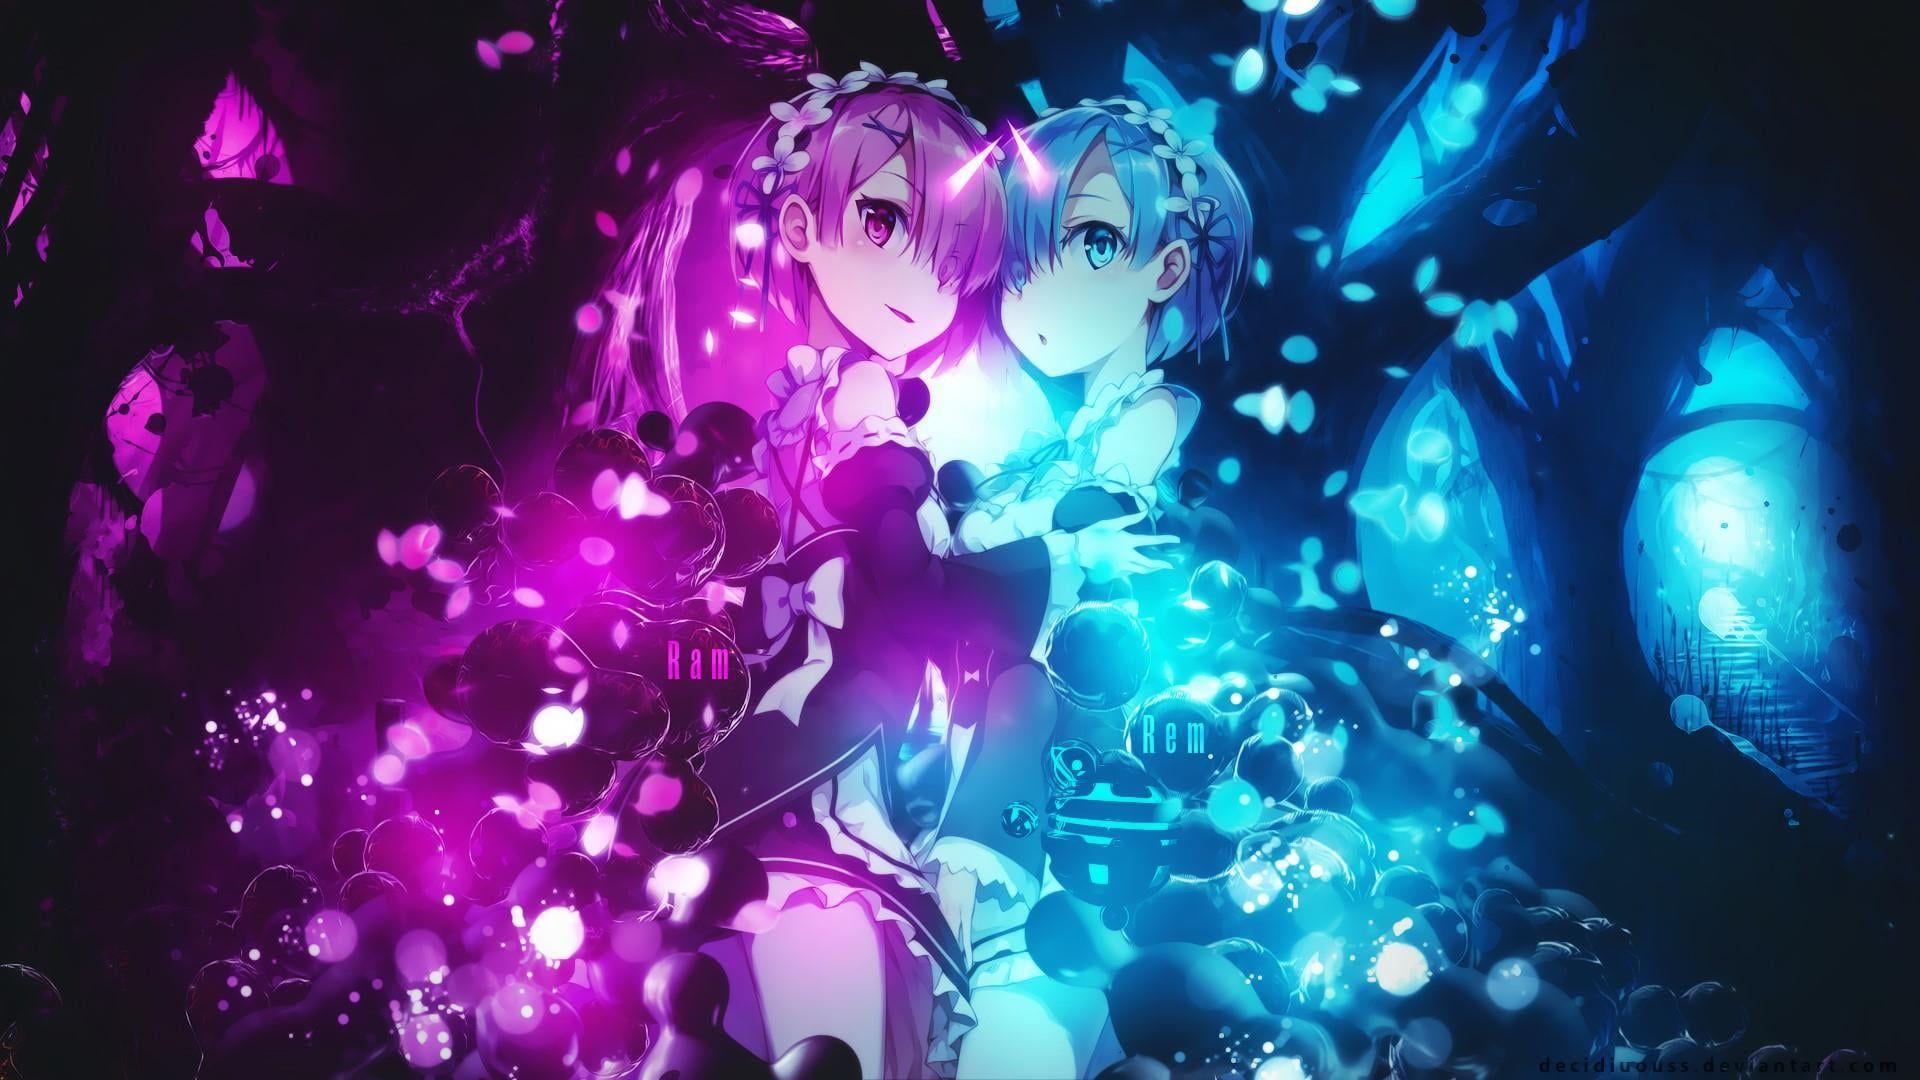 Re Zero Kara Hajimeru Isekai Seikatsu Rem Ram Anime 1080p Wallpaper Hdwallpaper Desktop Anime Wallpaper Hd Anime Wallpapers Anime